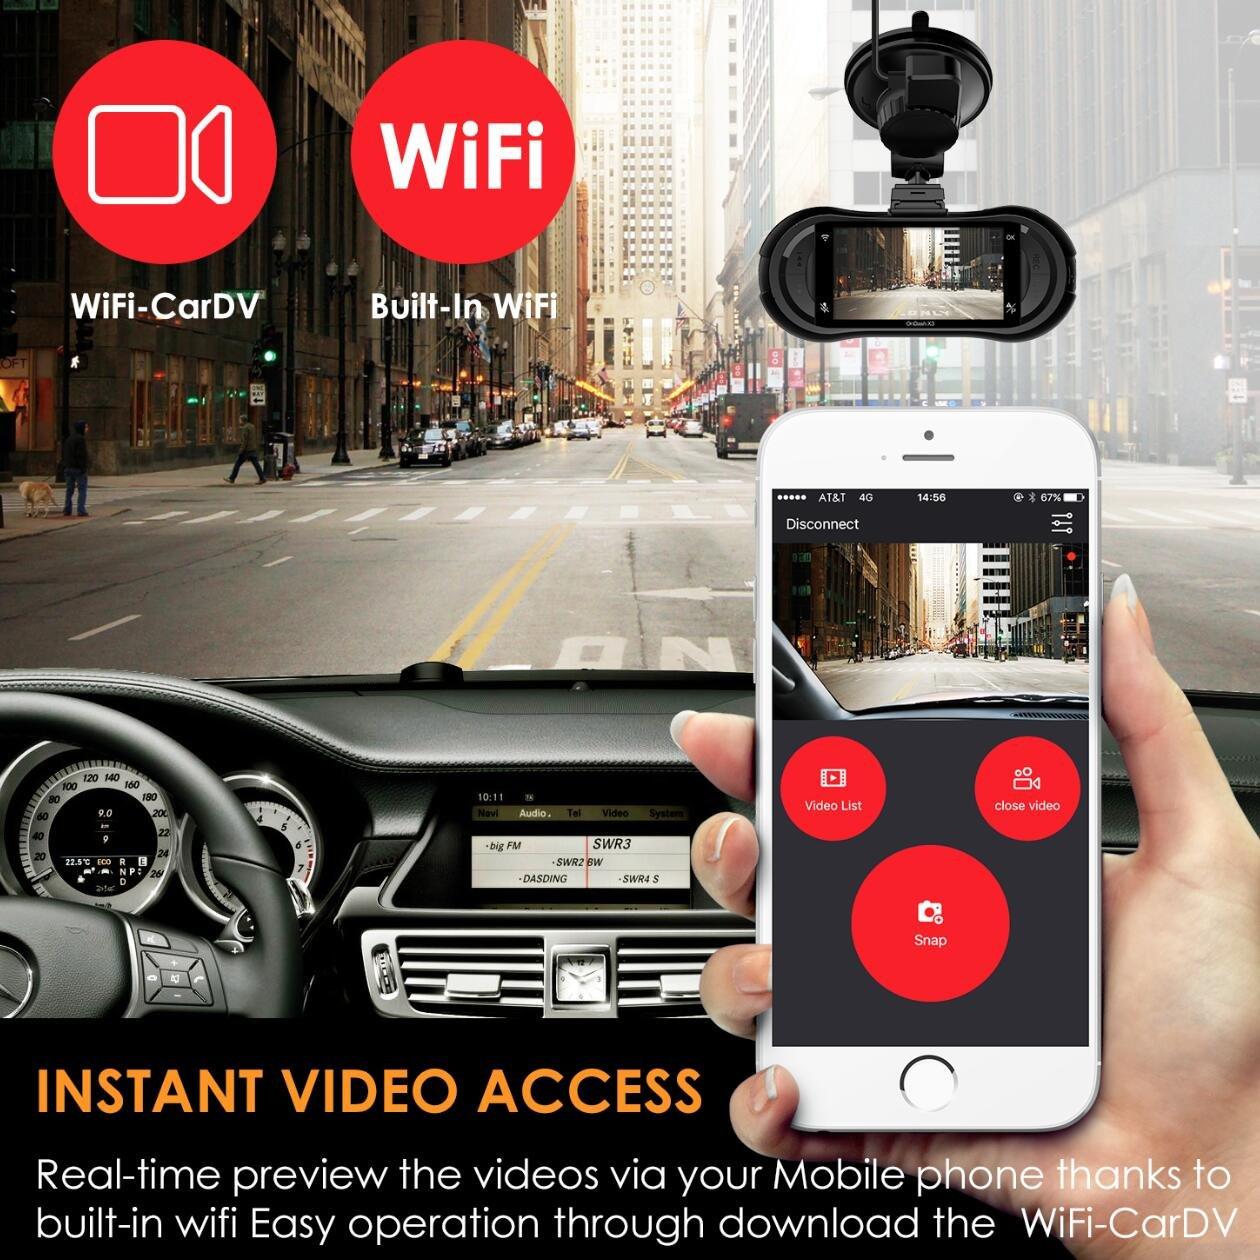 Vantrue X3 WIFI Dash Cam, Super HD 2.5K Car Dashboard Camera 1440P Car Camera with Ambarella A12 Chipset, 170°Wide Angle, Super HDR Night Vision, Loop Recording, Parking Mode, Motion Detection by VANTRUE (Image #3)